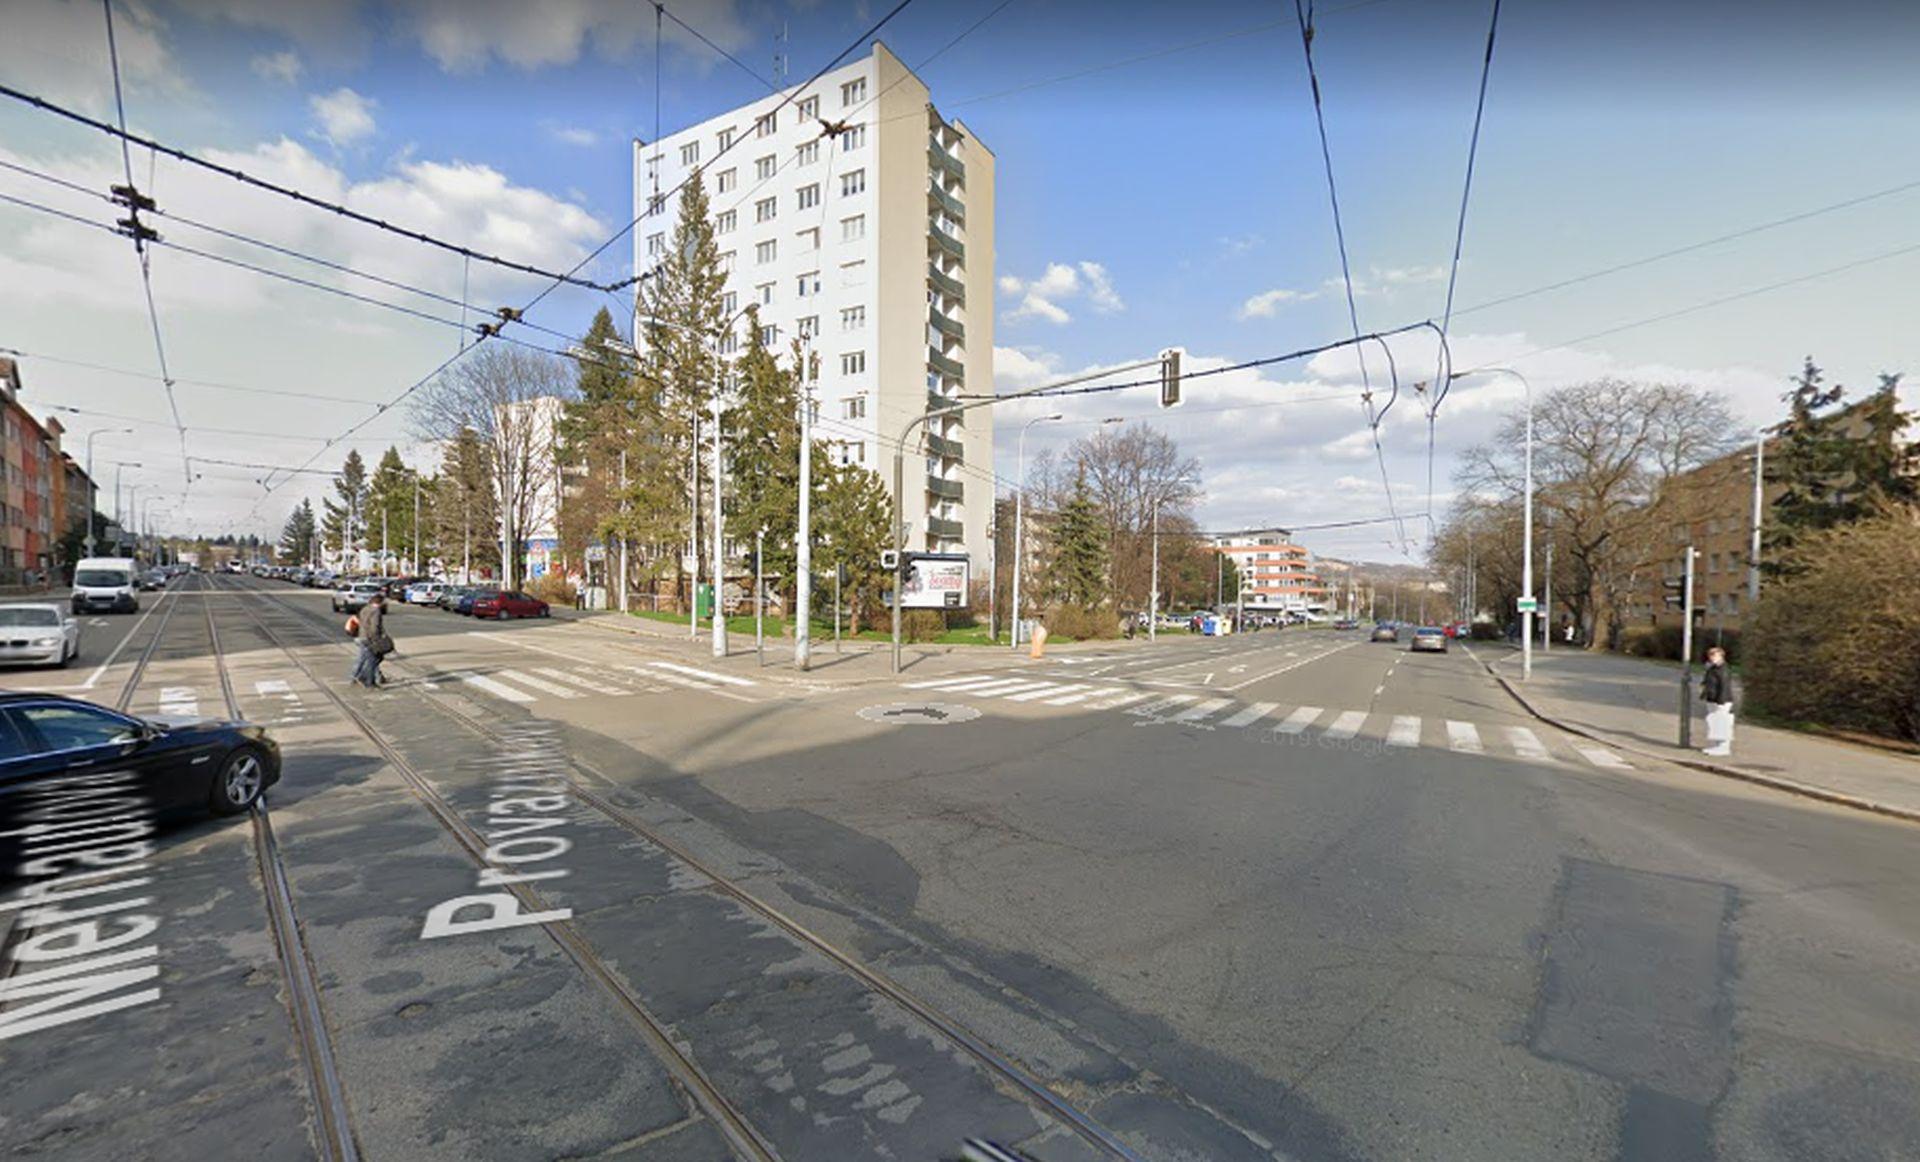 Křižovatka ulic Merhautova a Provazníkova v Brně. Foto: Google Street View